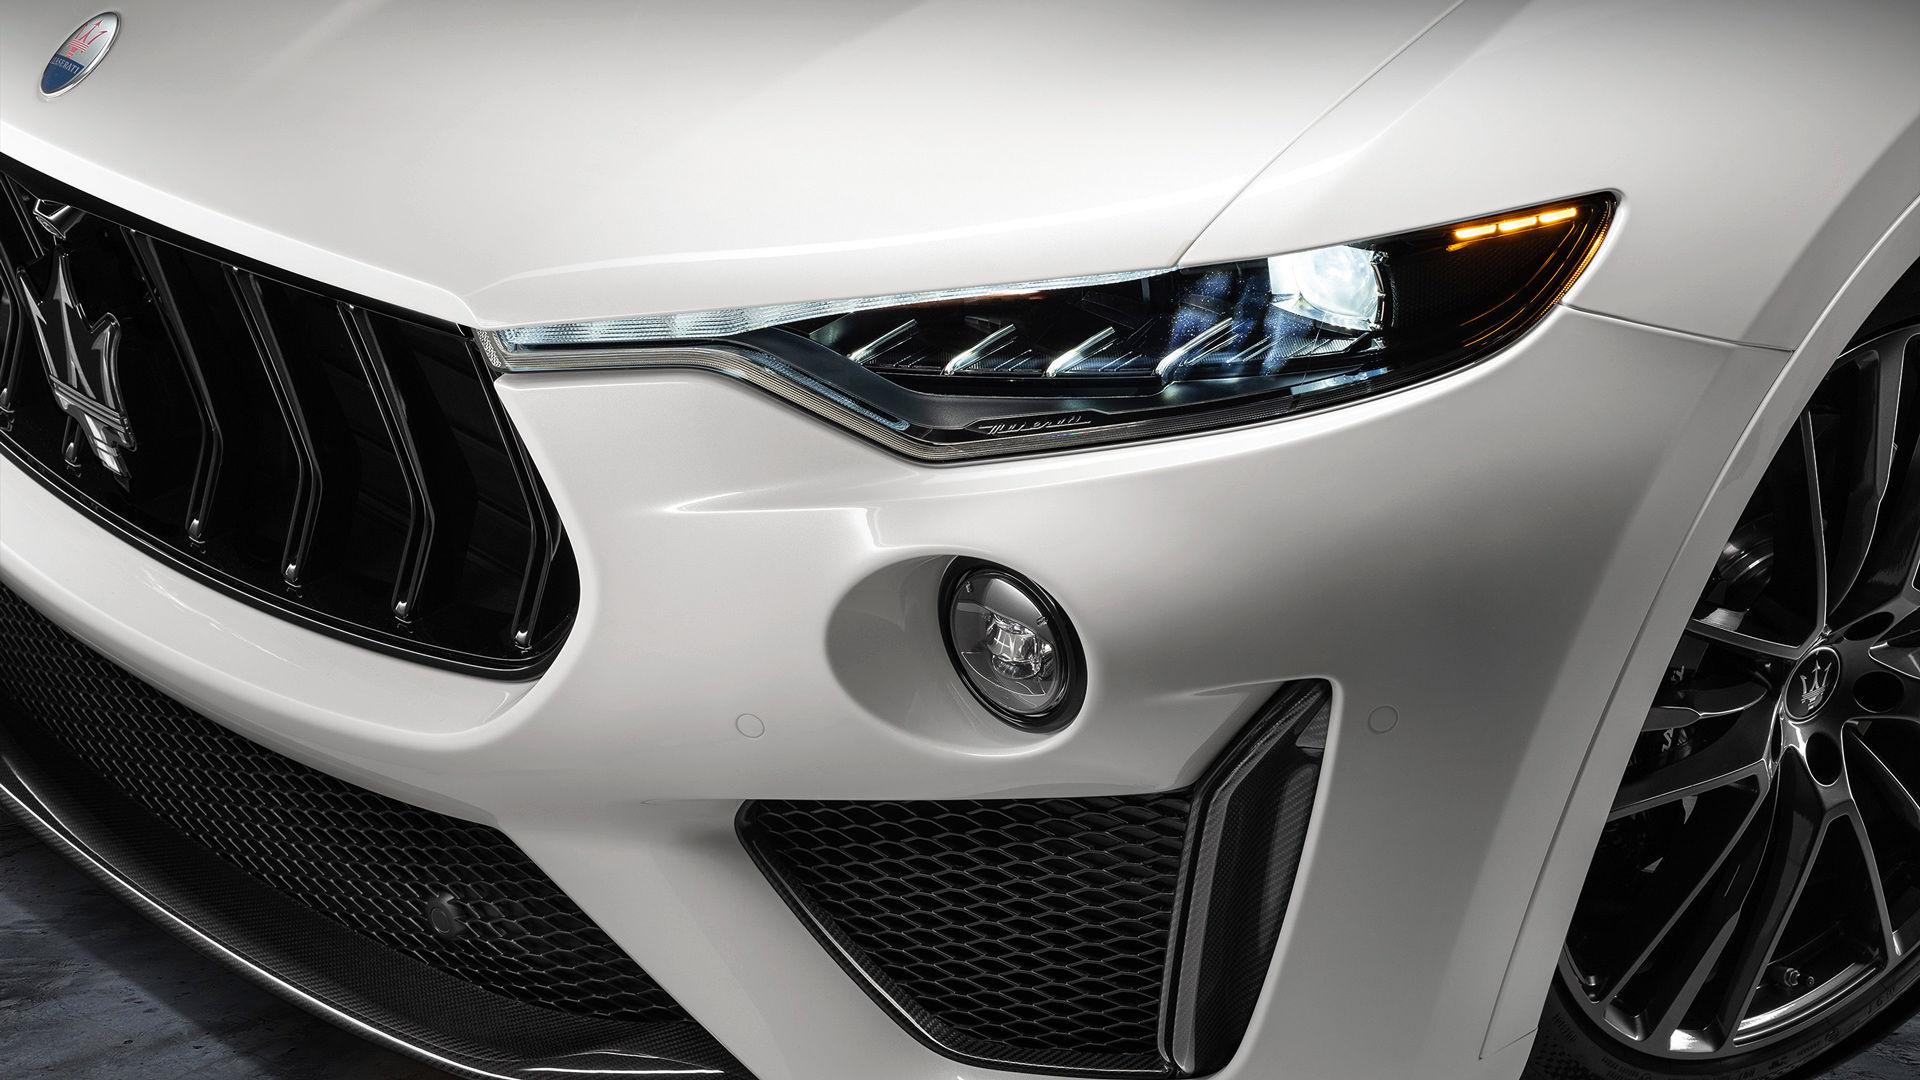 Maserati Levante Trofeo - Weiß - Scheinwerfer